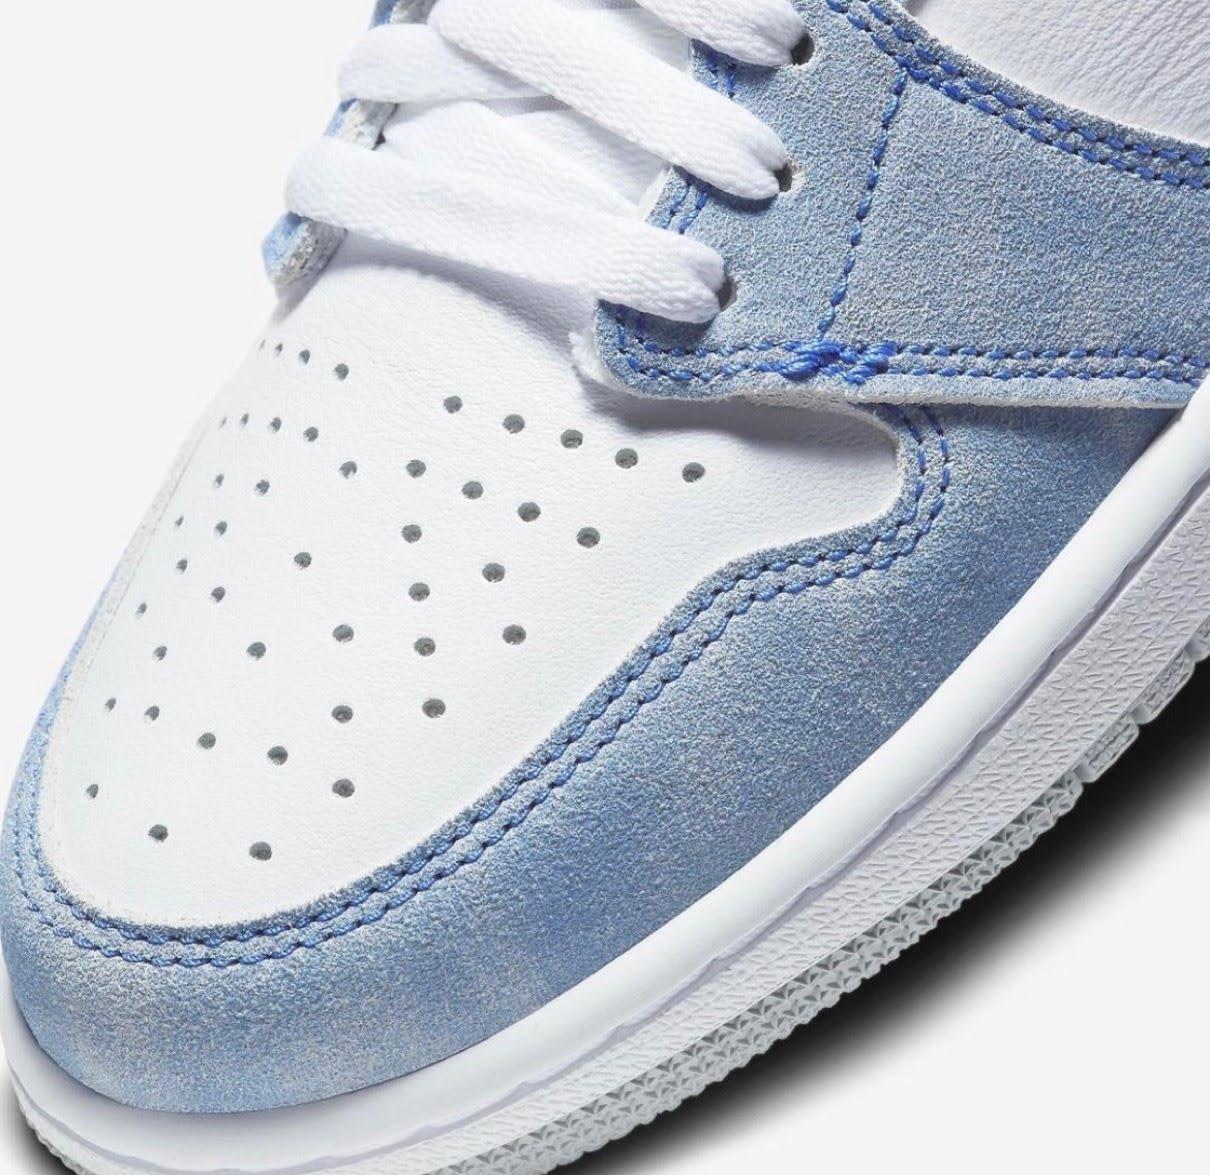 "Nike Air Jordan 1 High OG ""Hyper Royal"" / ナイキ エア ジョーダン 1 ハイ OG ""ハイパーロイヤル"" 555088-402 official toe"